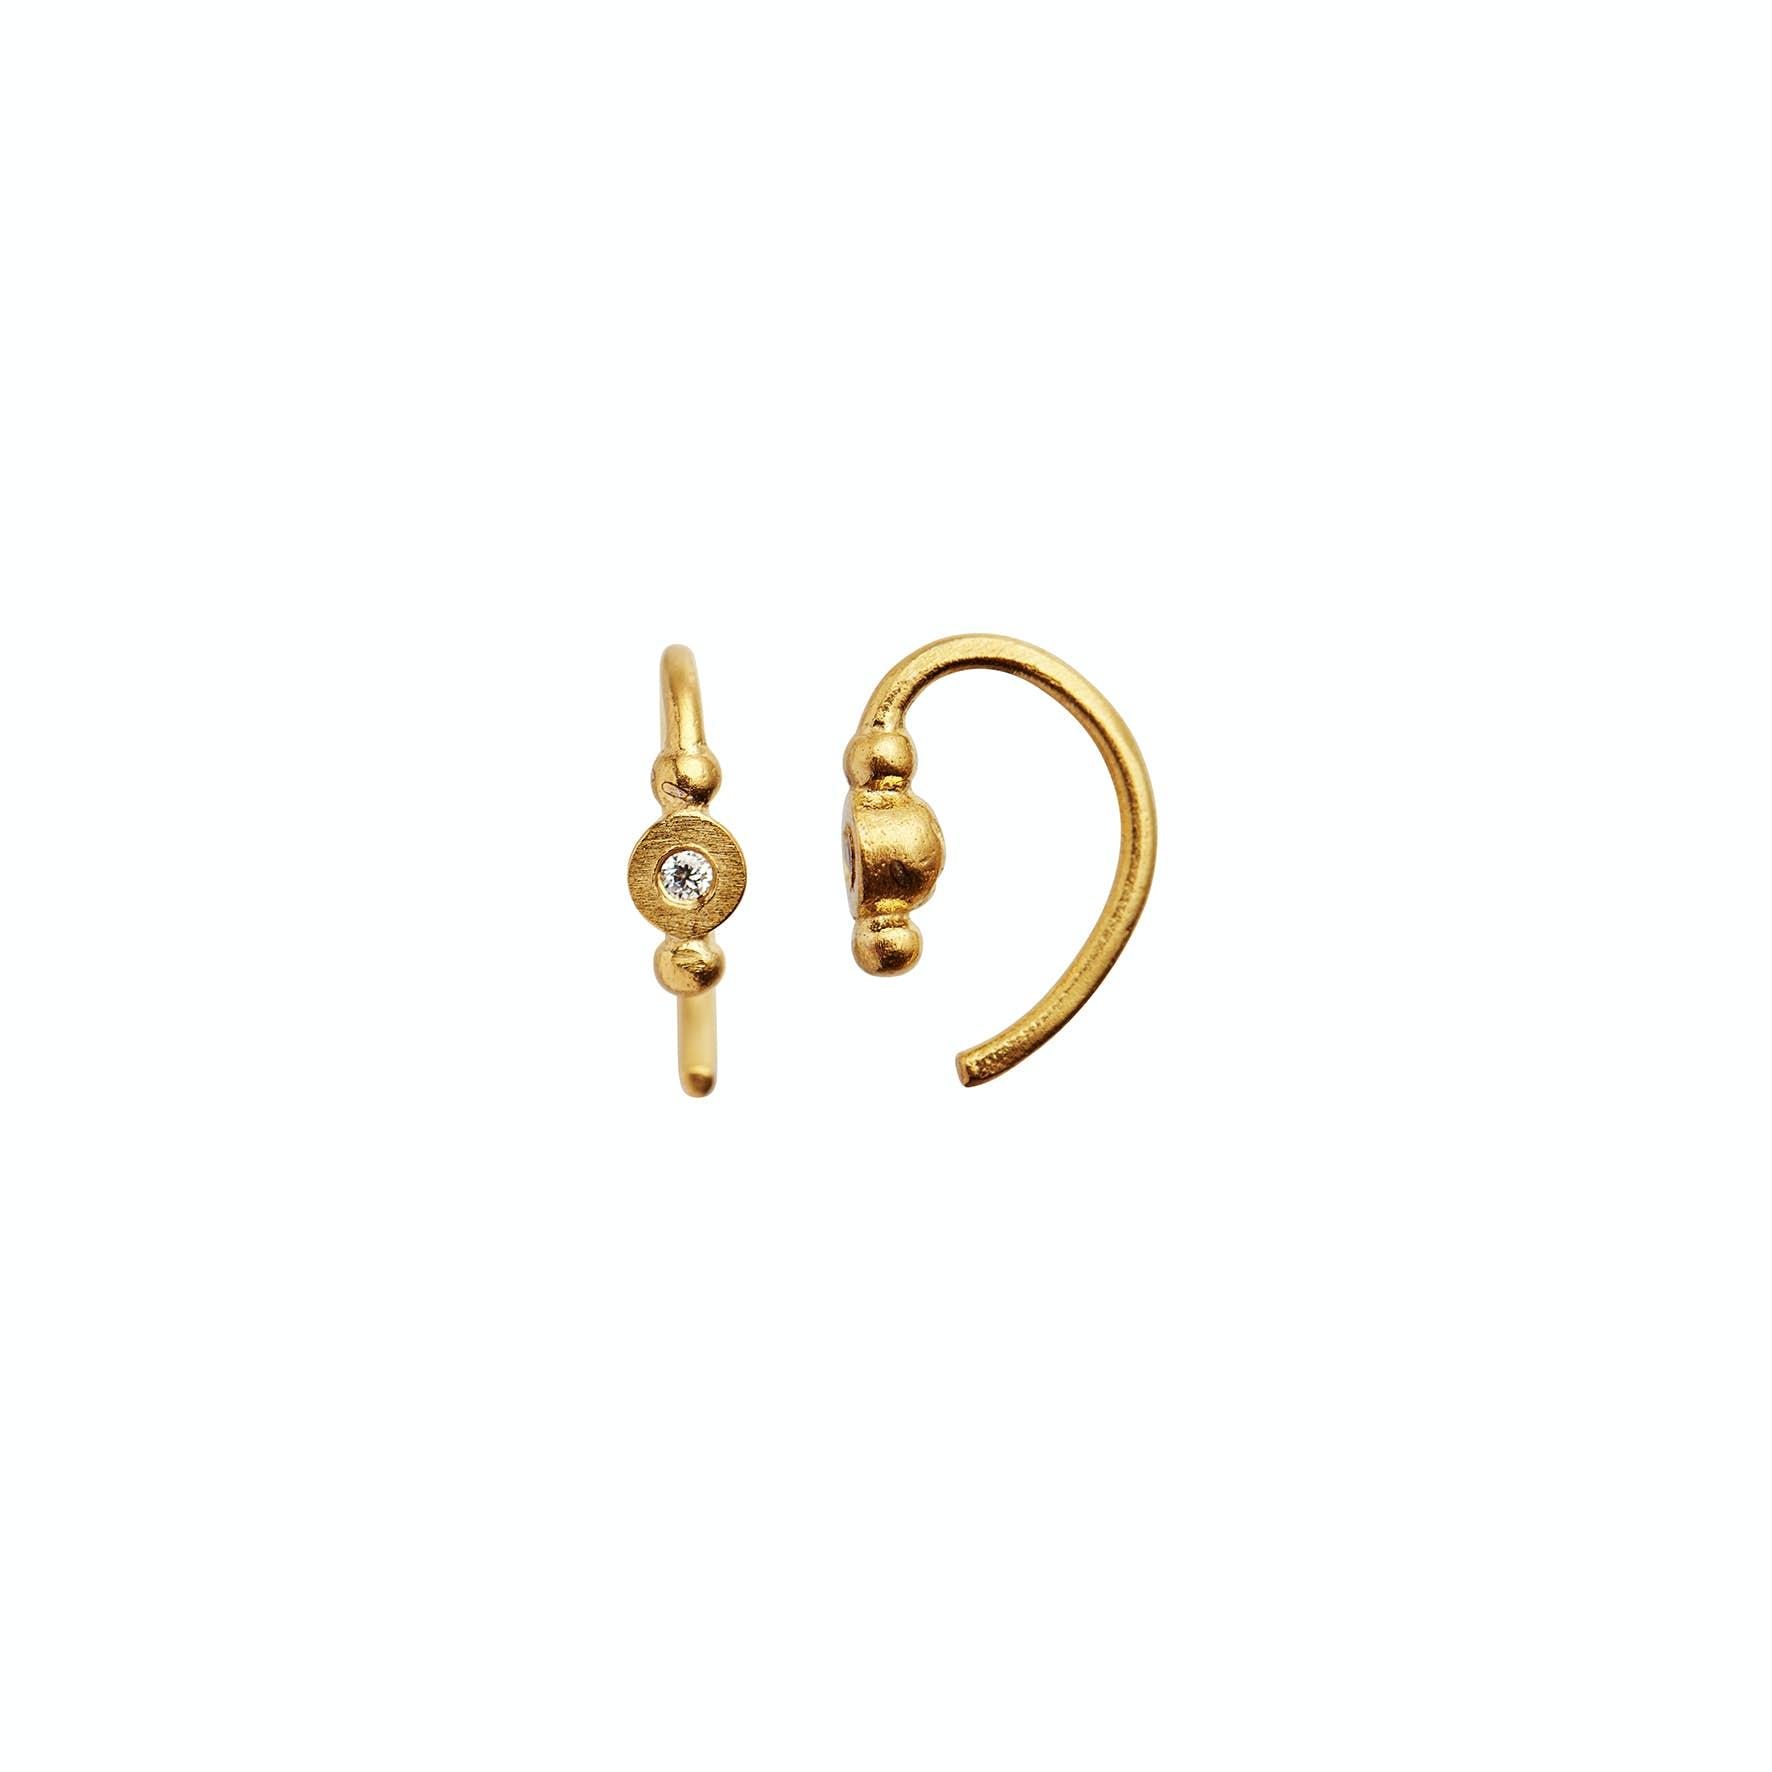 Petit Bon-Bon White Zircon Earring Piece from STINE A Jewelry in Goldplated-Silver Sterling 925